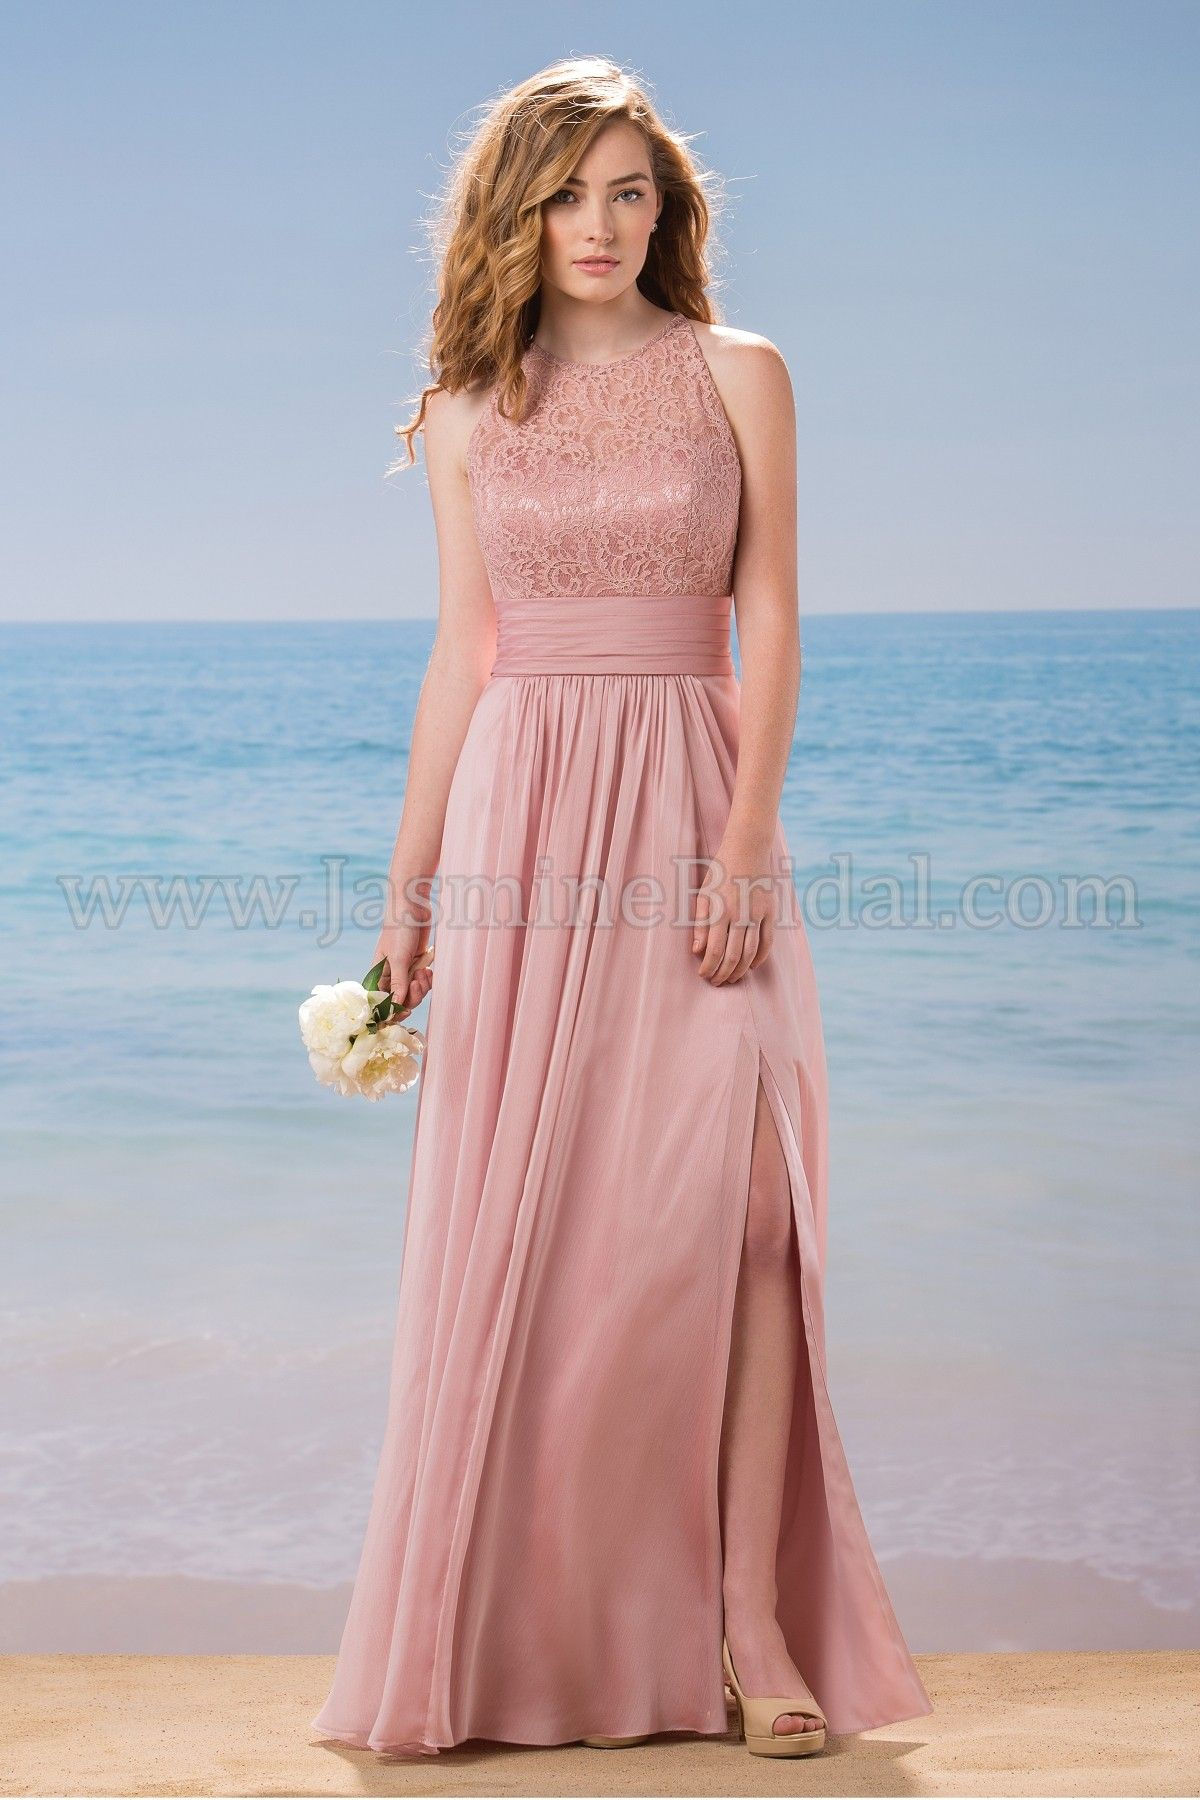 Jasmine Bridal | Aiya | Pinterest | Vestido elegante, Elegante y Rojo